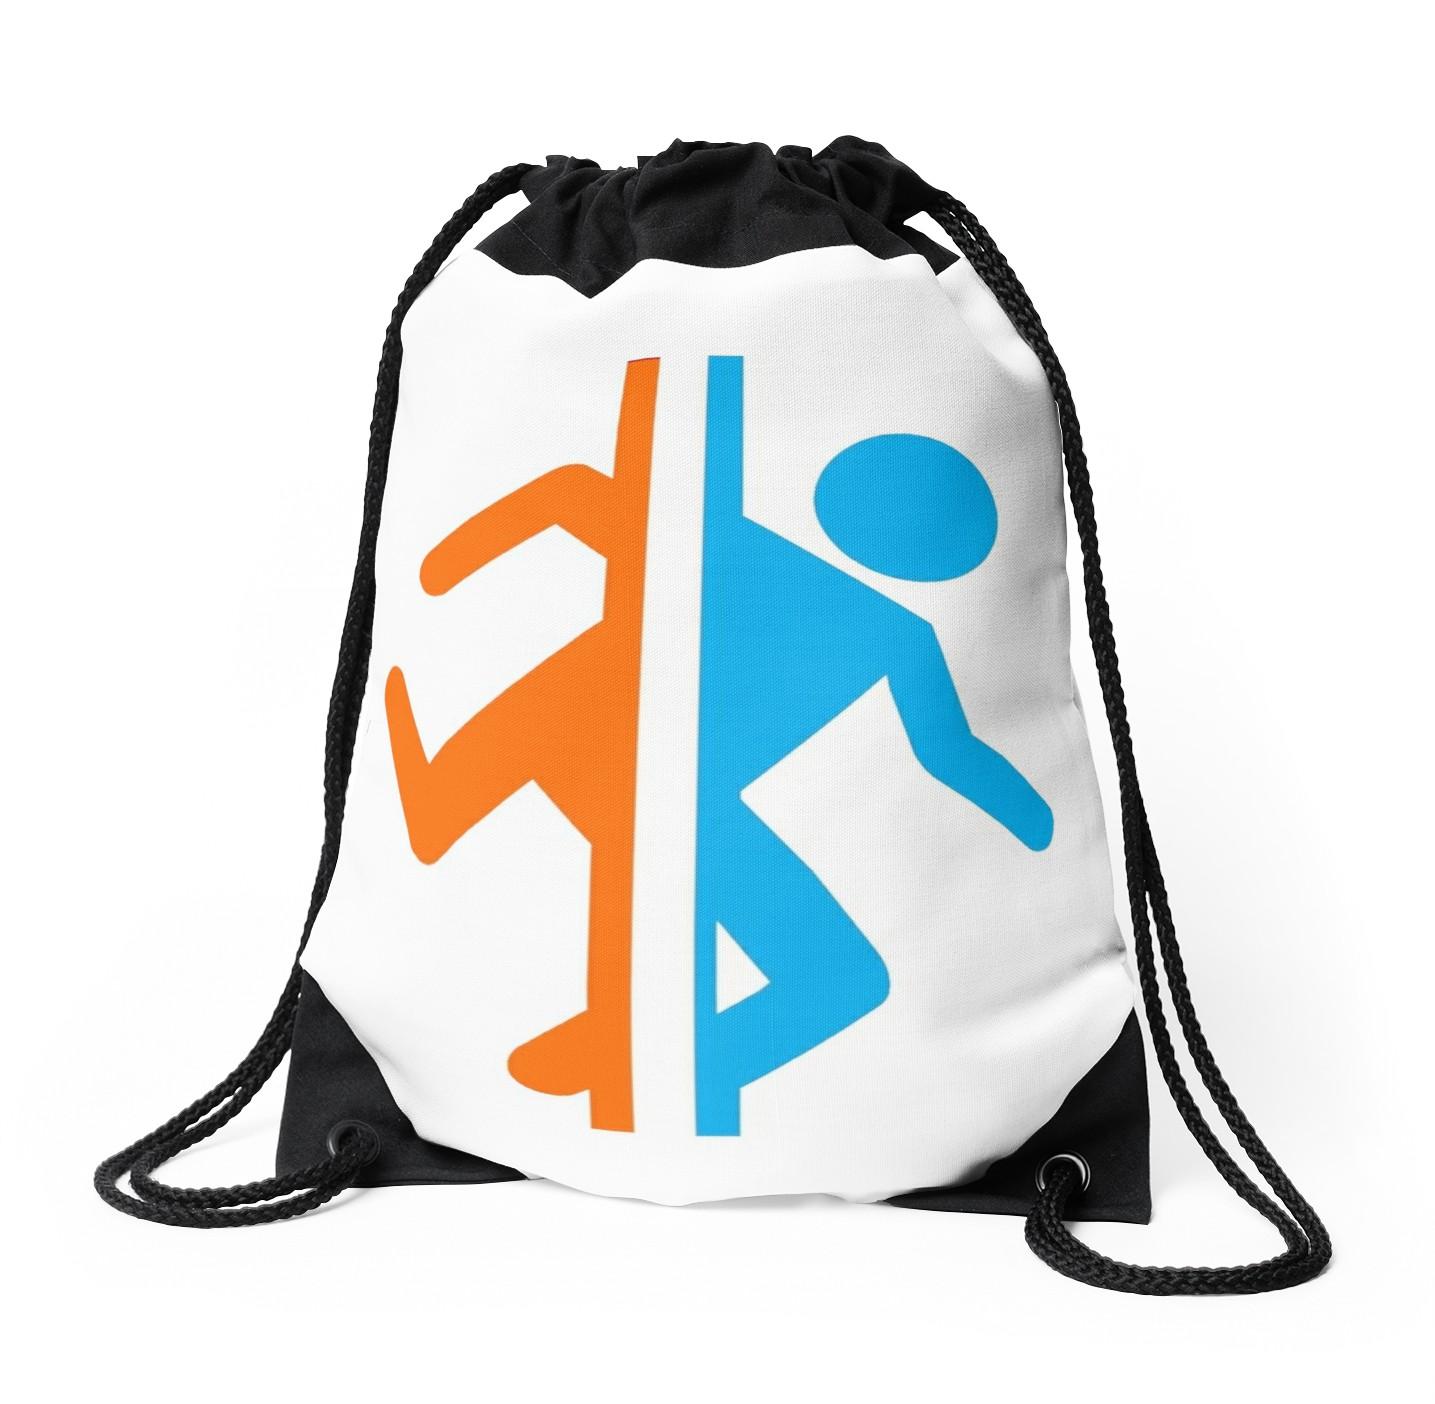 1435x1404 Portal Silhouette Drawstring Bags By Redbubble